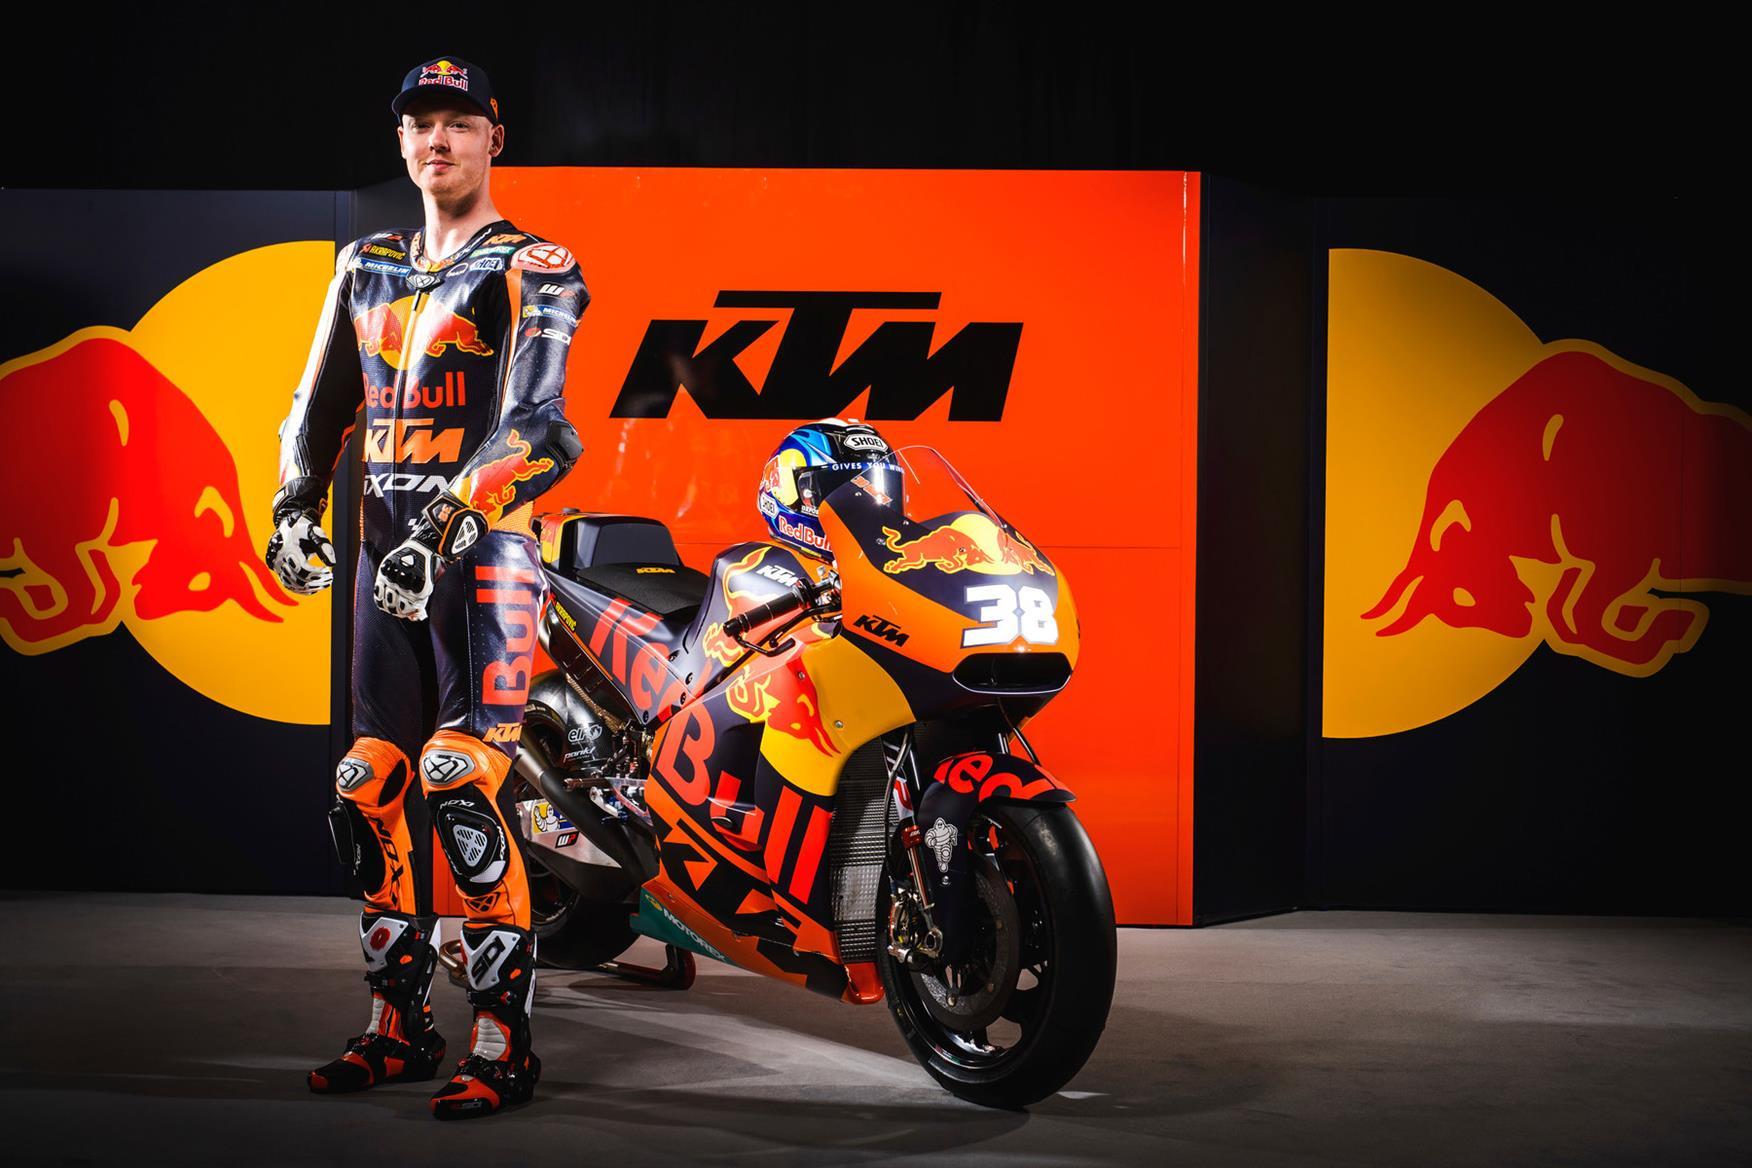 Gallery: Red Bull KTM's 2017 MotoGP RC16 | MCN